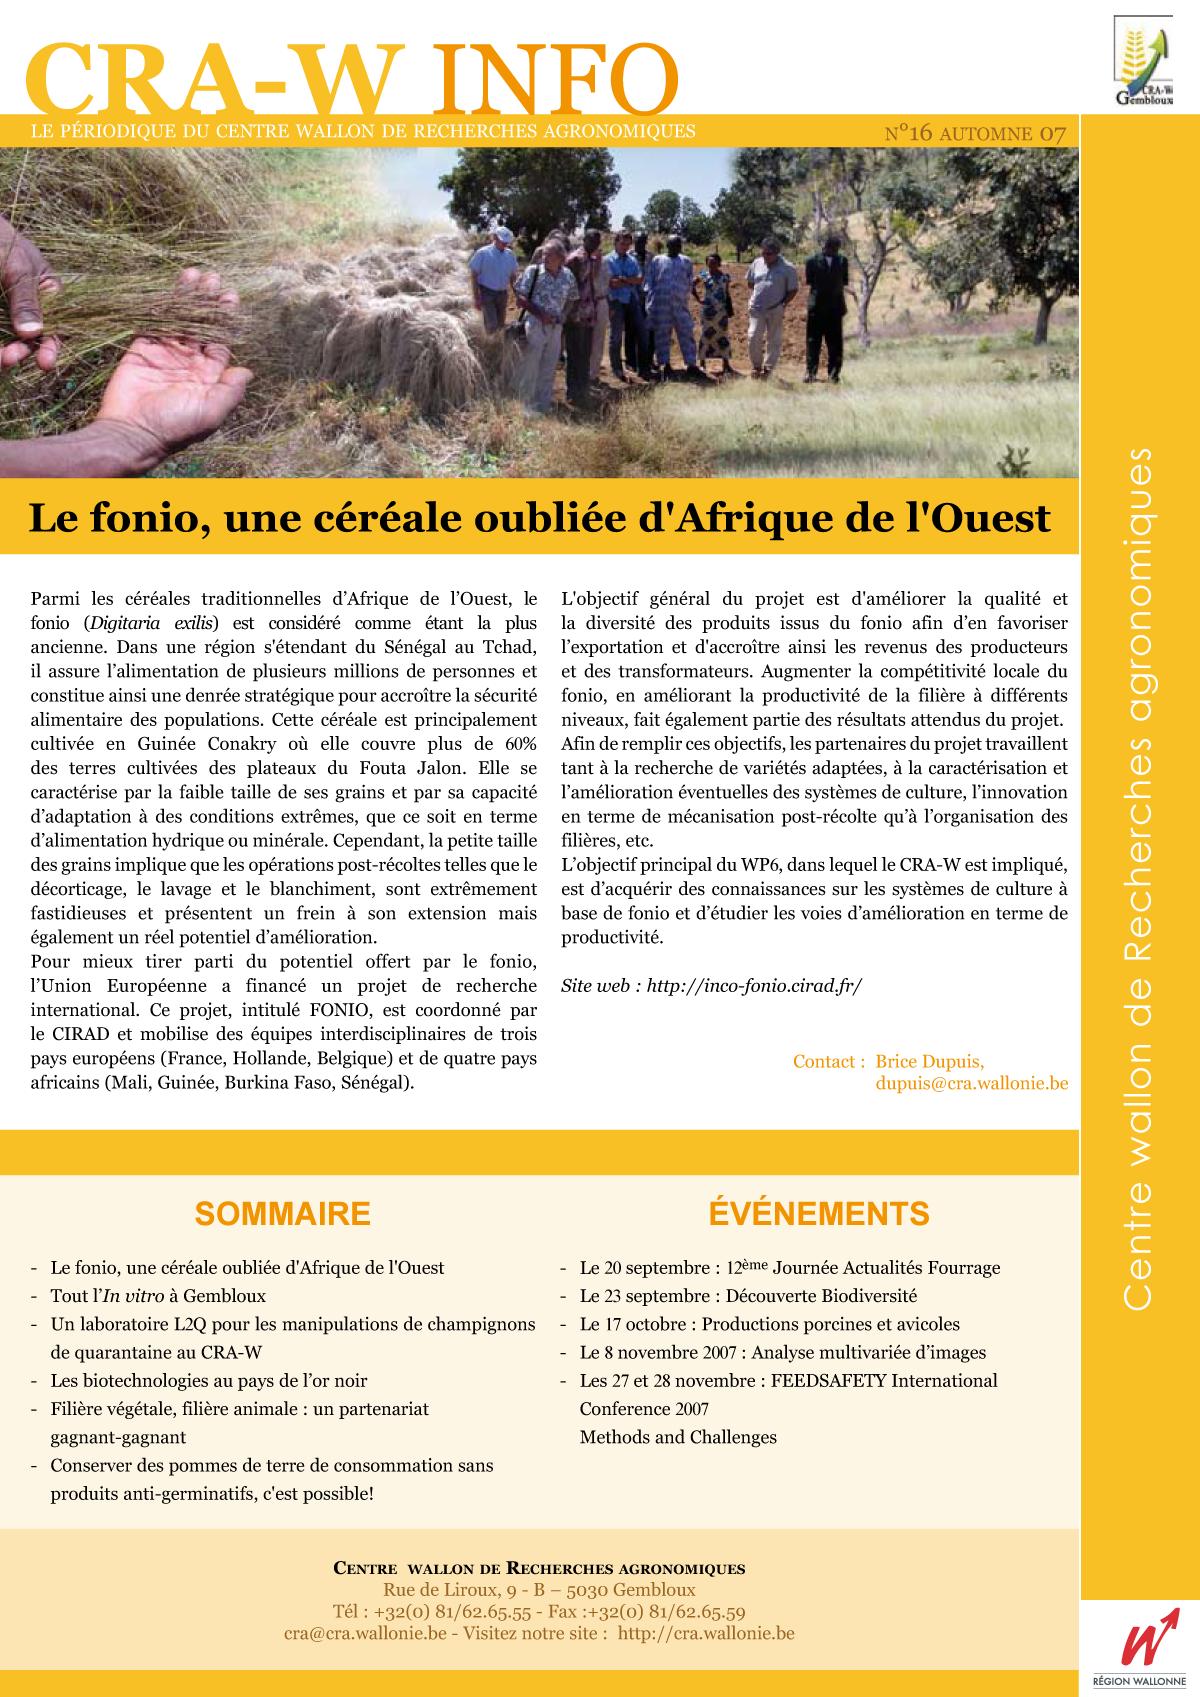 CRAW info n° 16